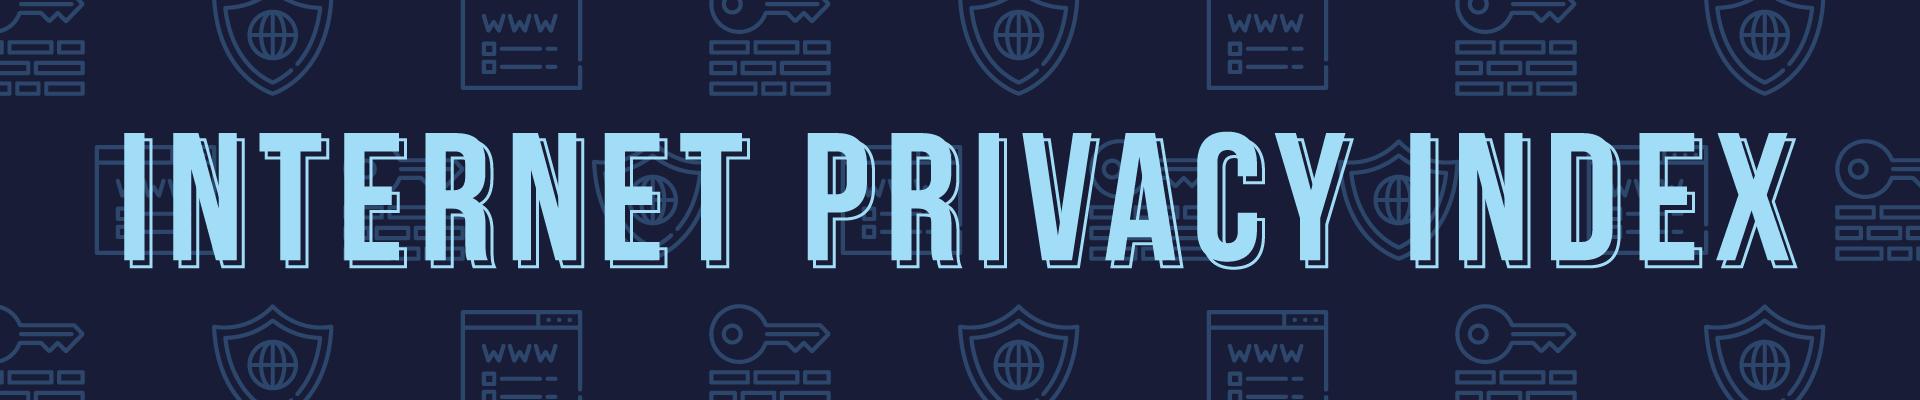 internet privacy index header